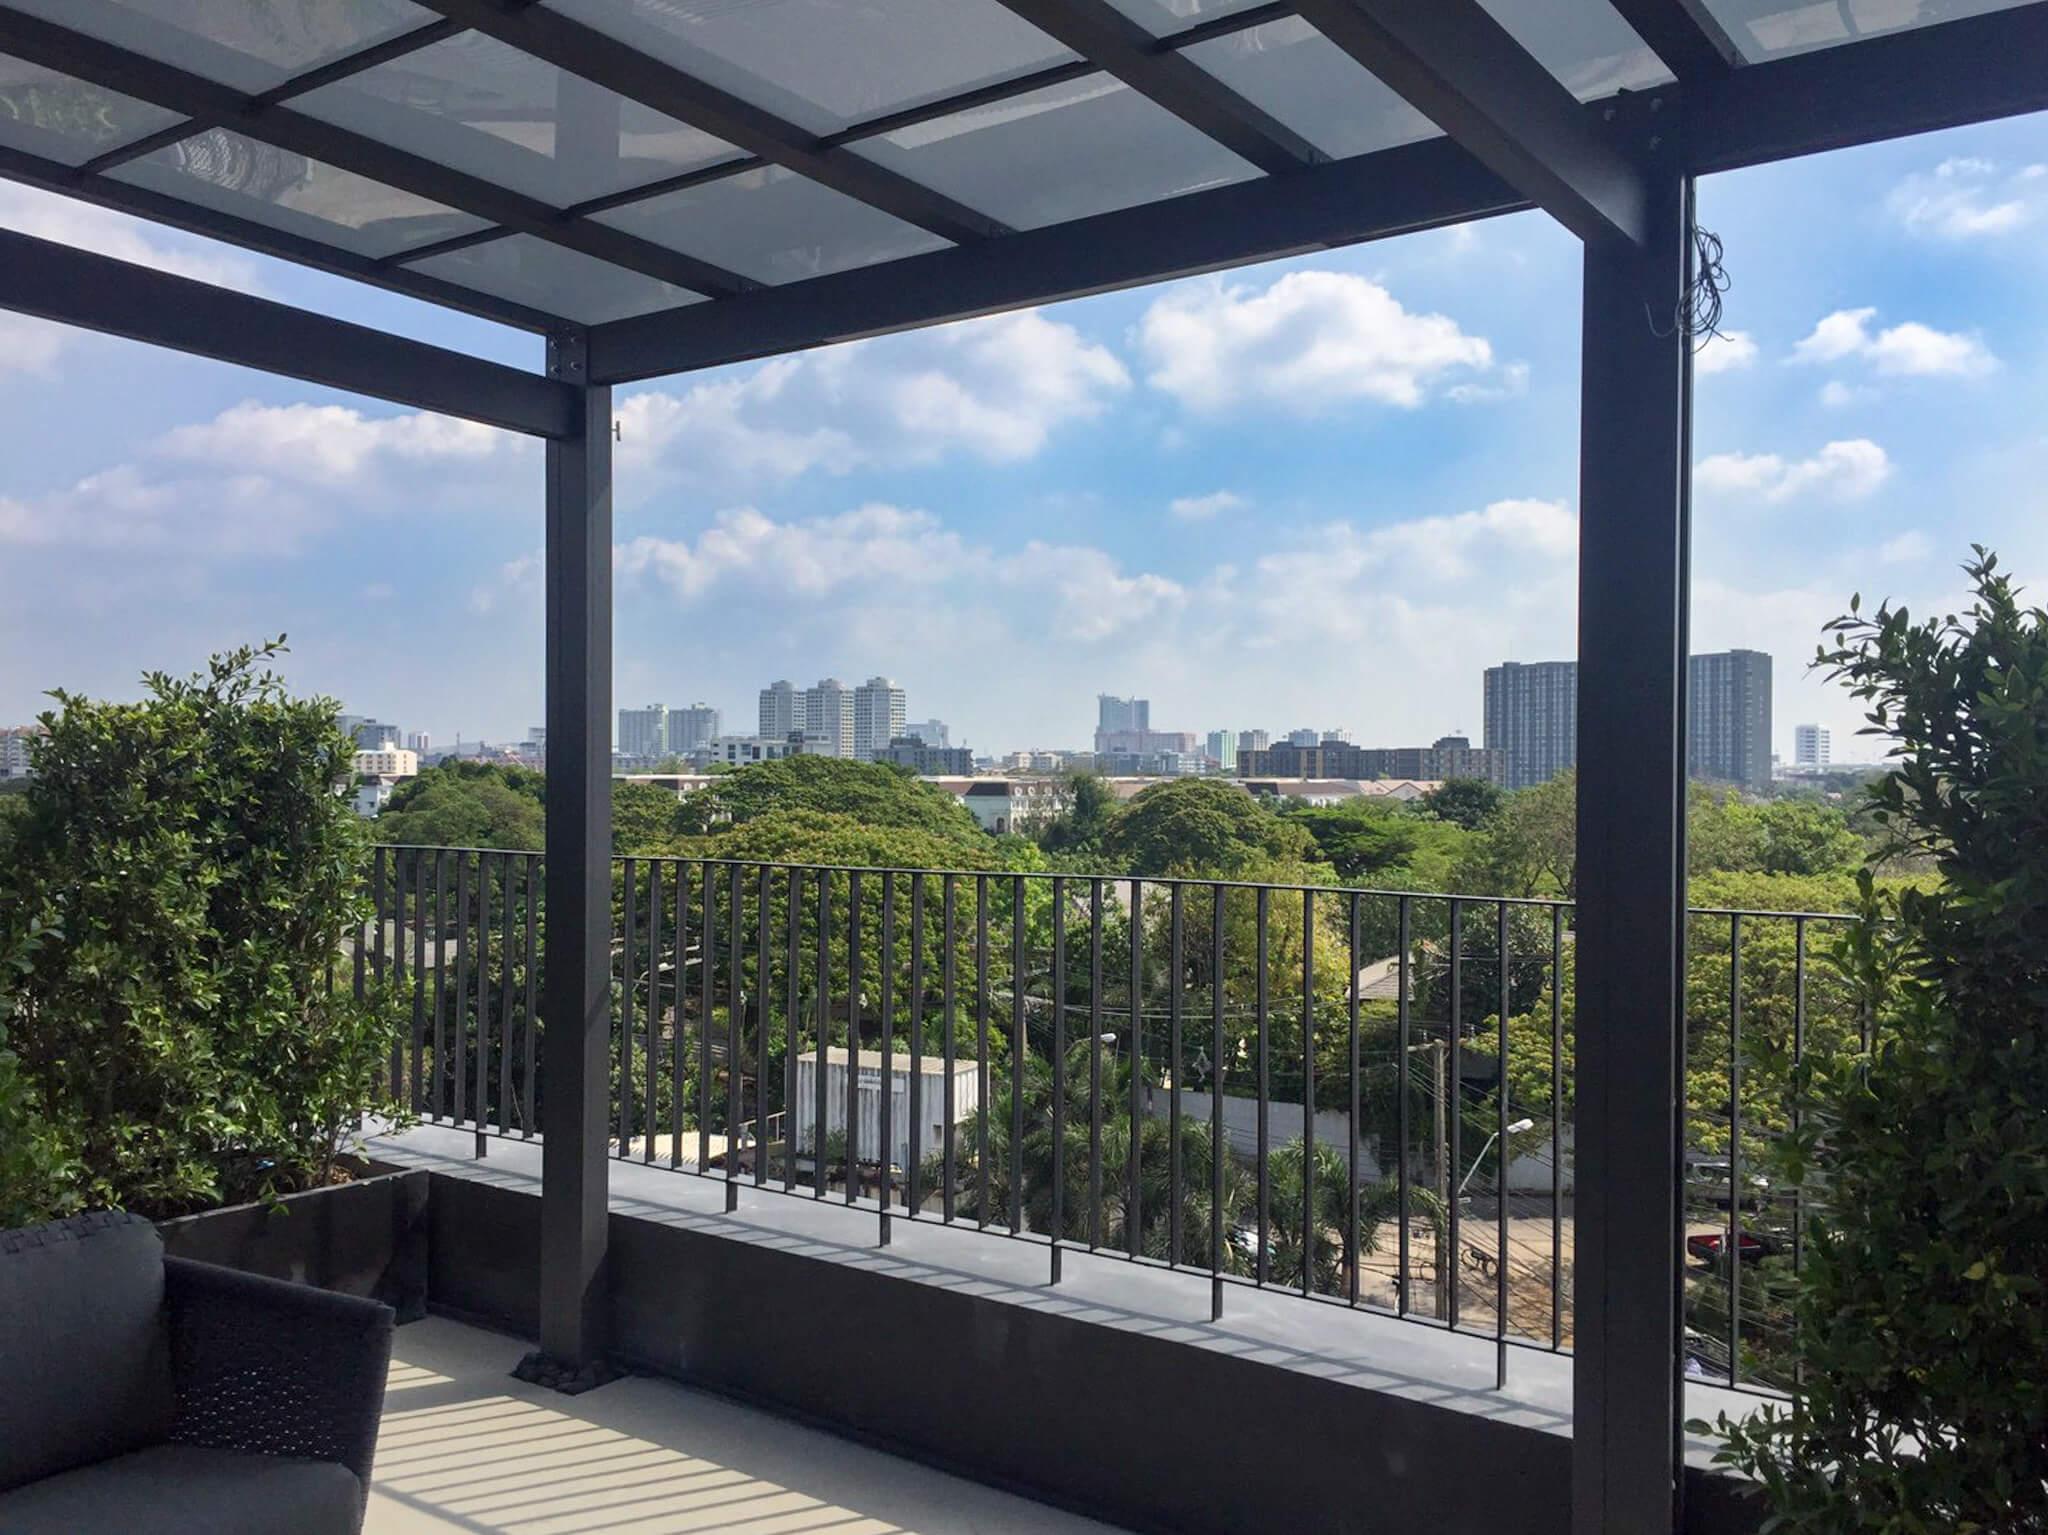 AIRES RAMA9 รีวิว Luxury Townhome 3.5 ชั้น + Rooftop ออกแบบสวย ย่านพระราม9 (ใกล้ รพ.สมิติเวช) 86 - AIRES